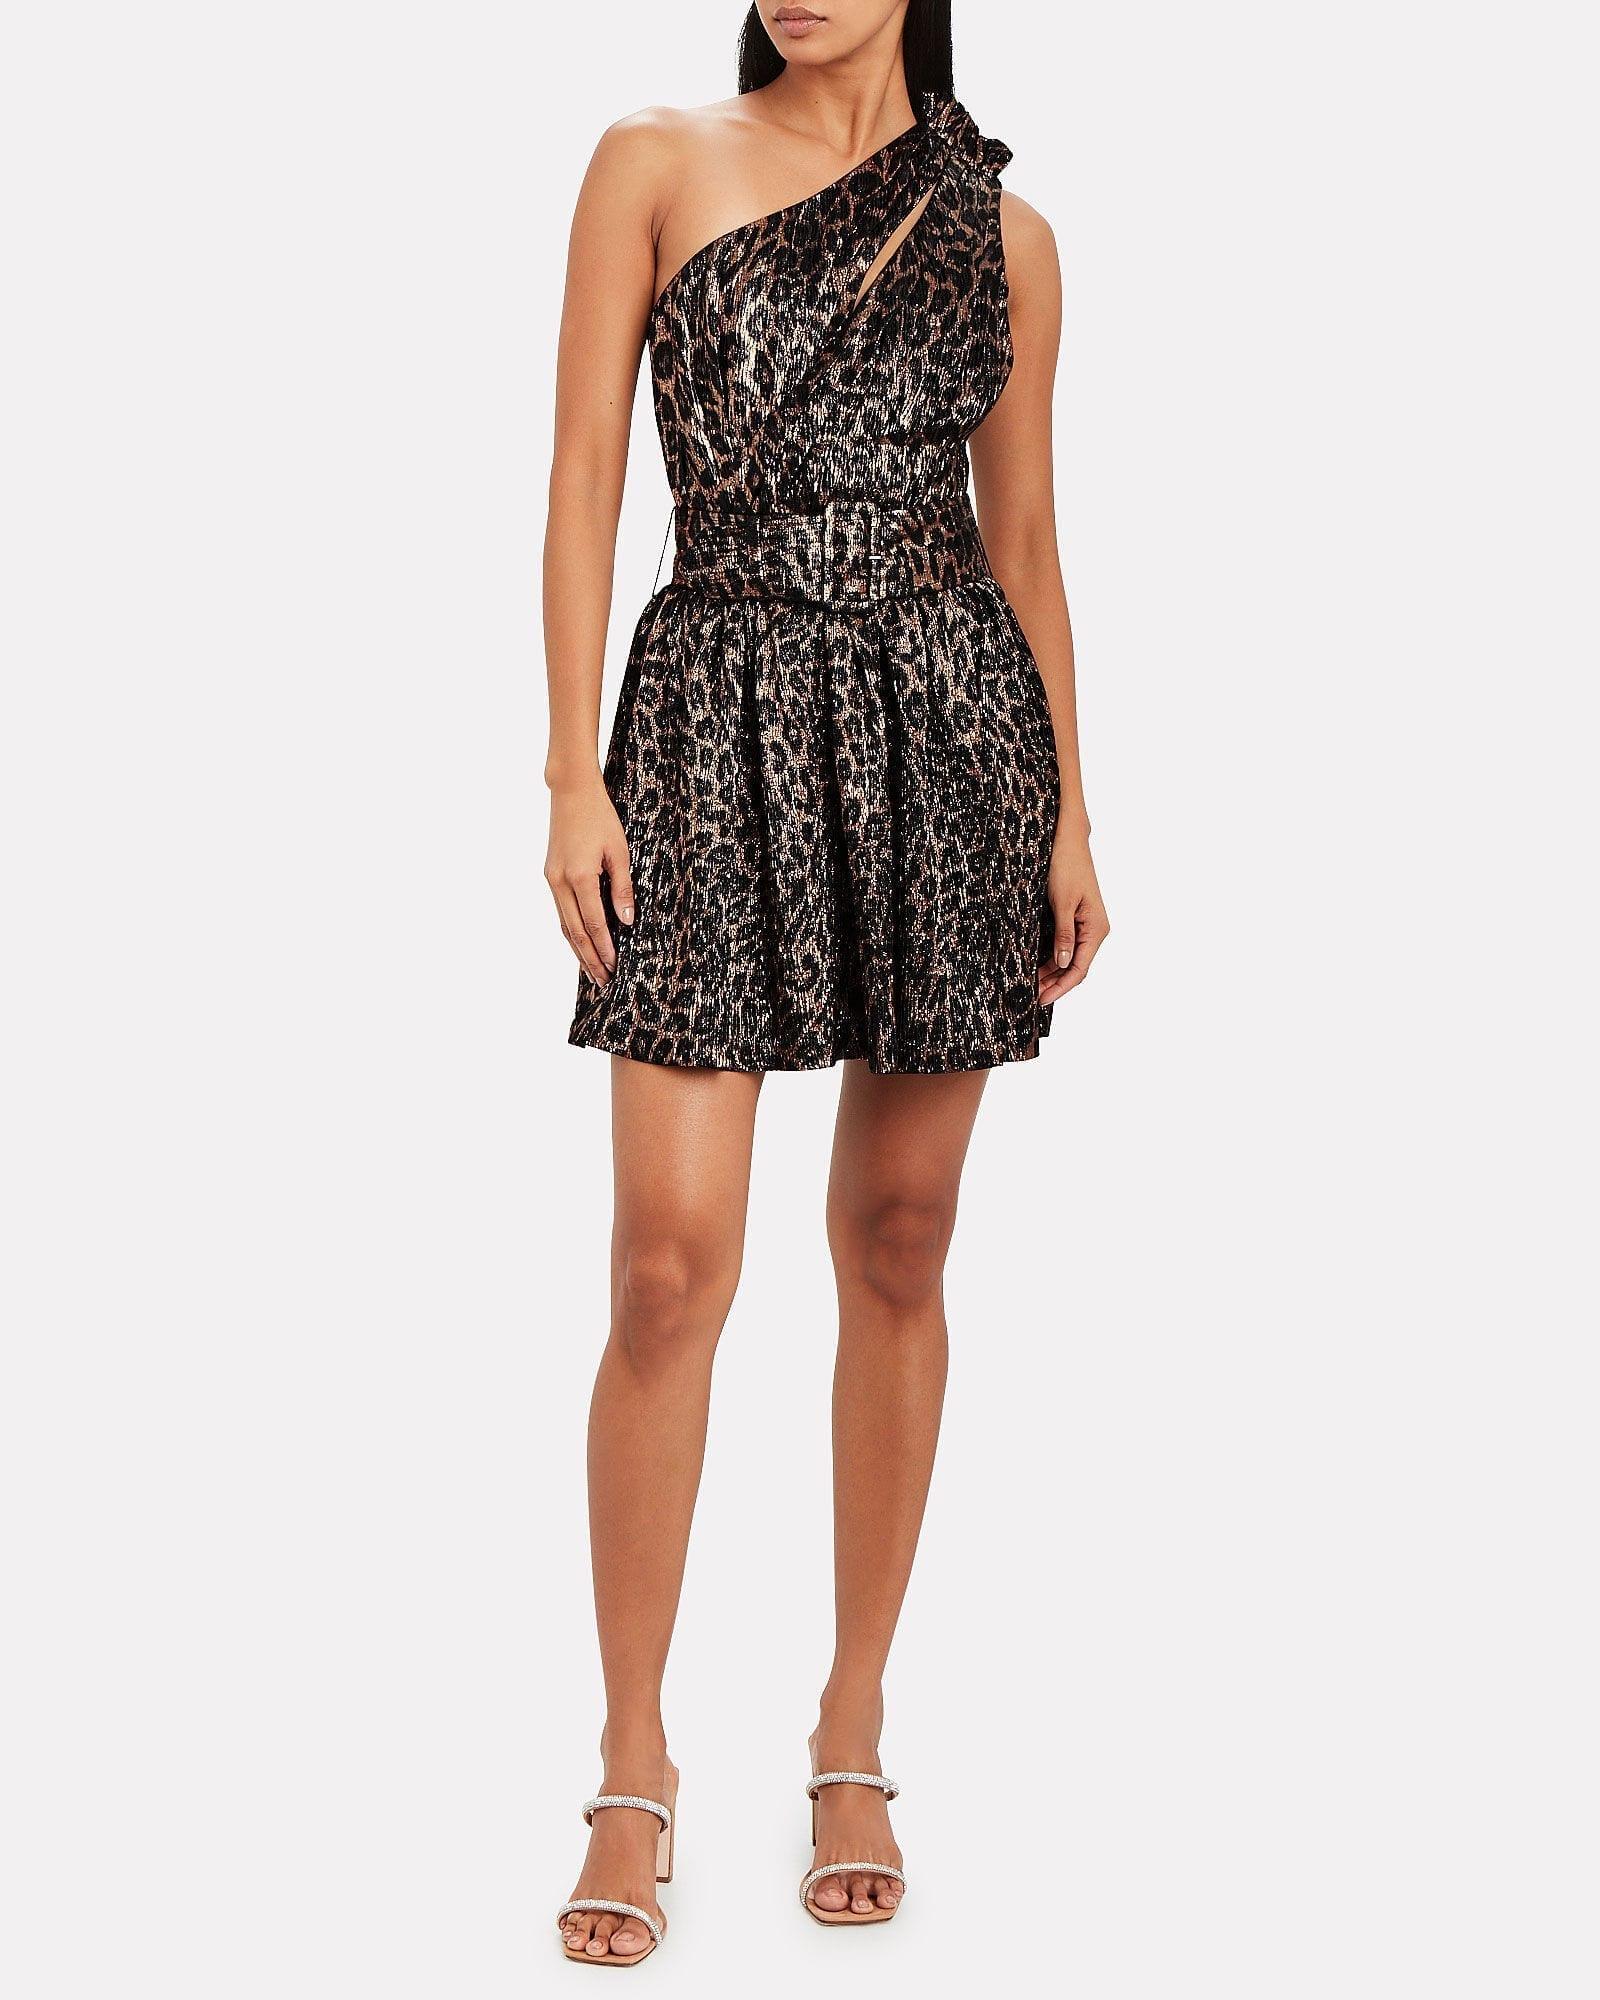 RETROFÊTE Kayla Leopard Lamé Mini Dress